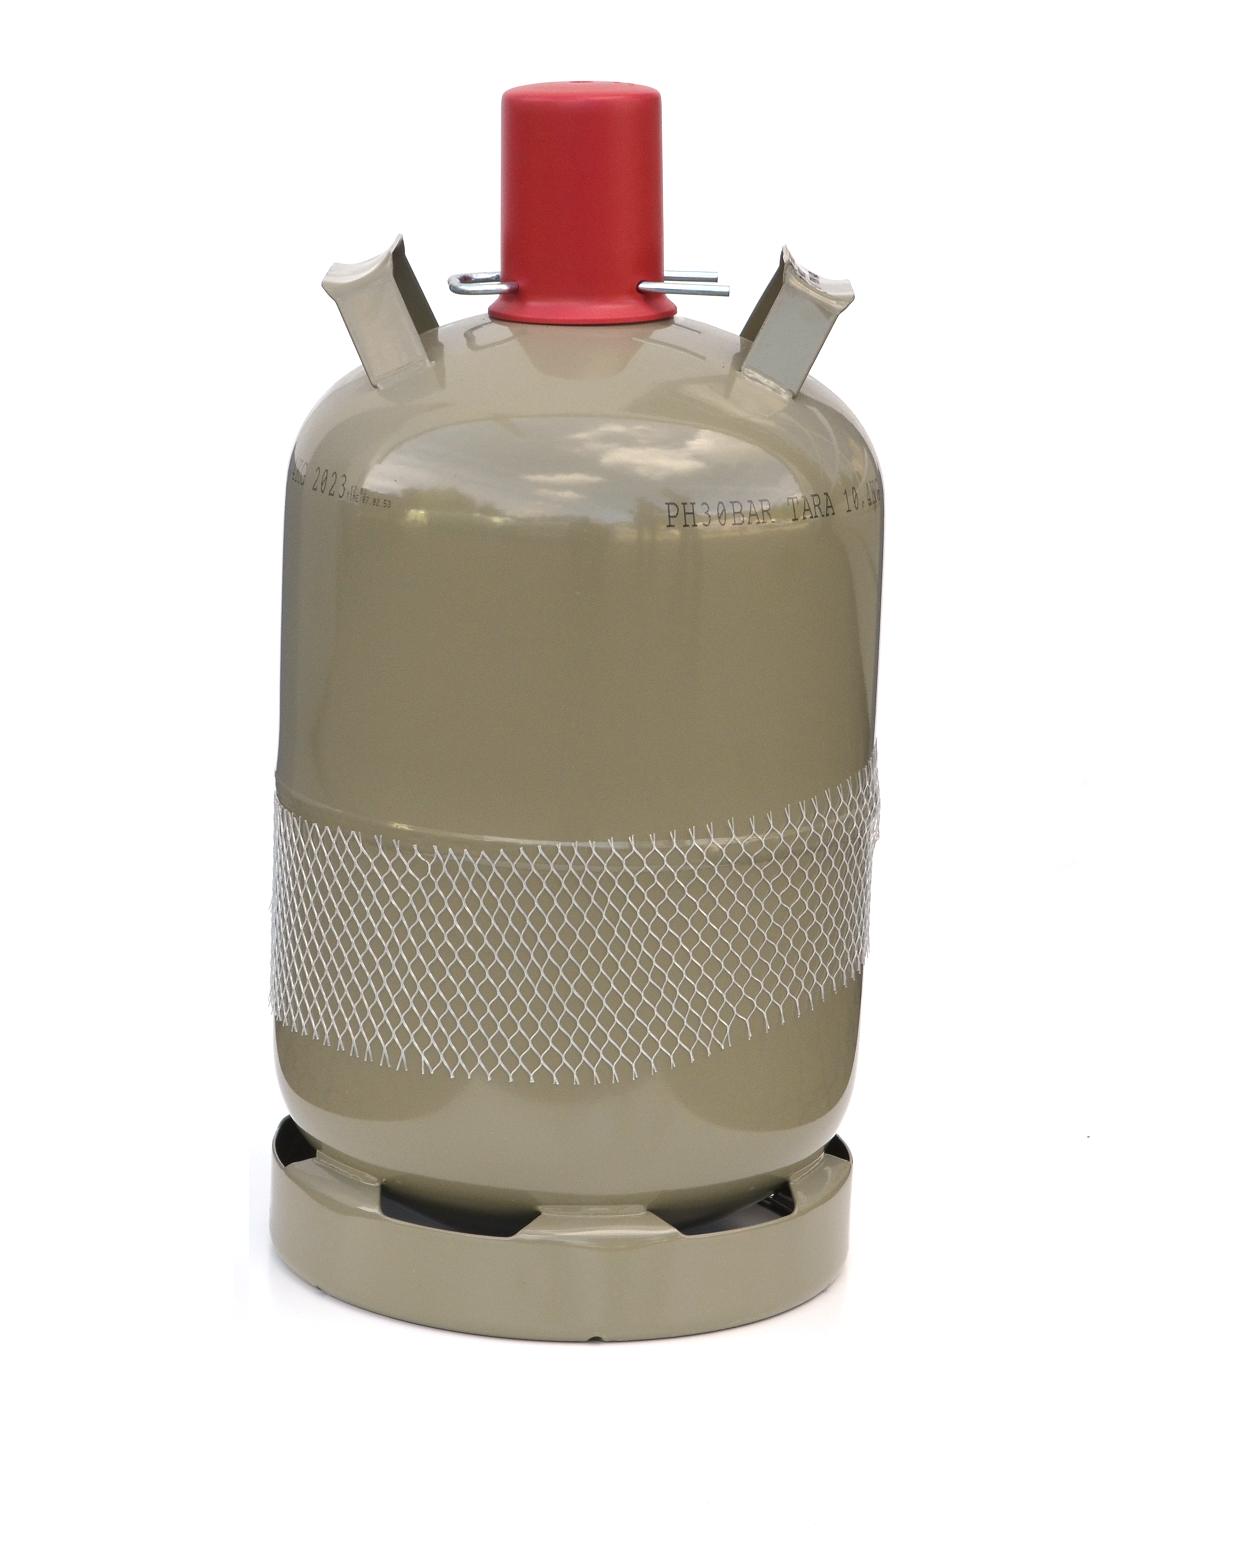 11 kg propangasflasche neu gasflasche heizen kochen. Black Bedroom Furniture Sets. Home Design Ideas